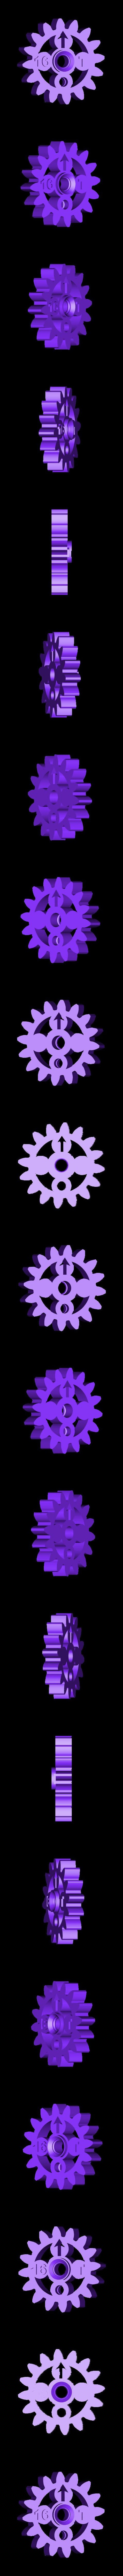 GEAR-16T_R2.stl Download free STL file Math Gear(s) • 3D print design, WorksBySolo